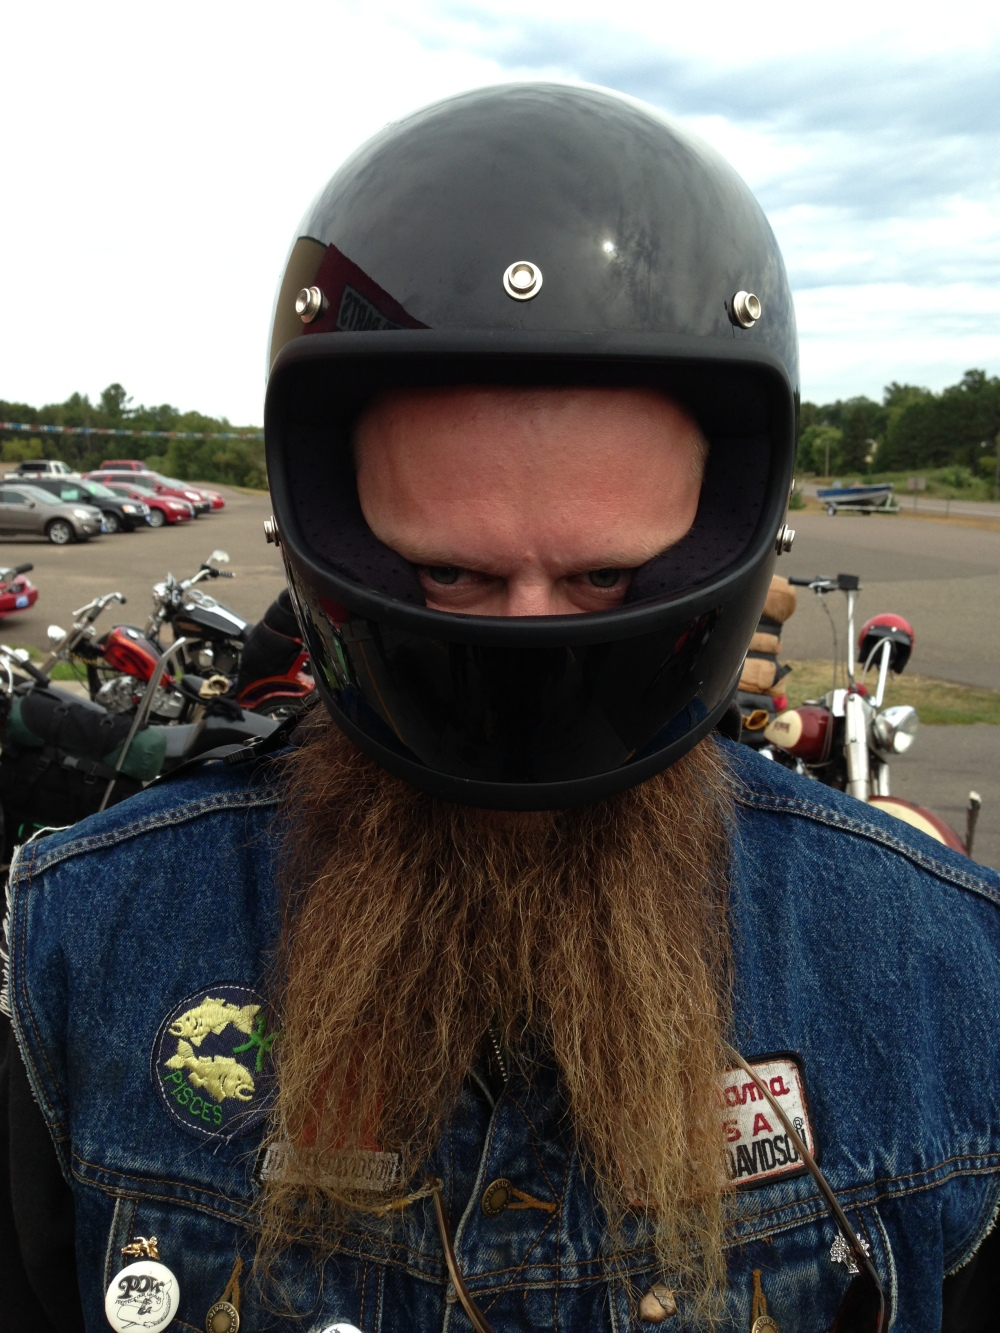 Beardo's Beardo Biltwell Helmet